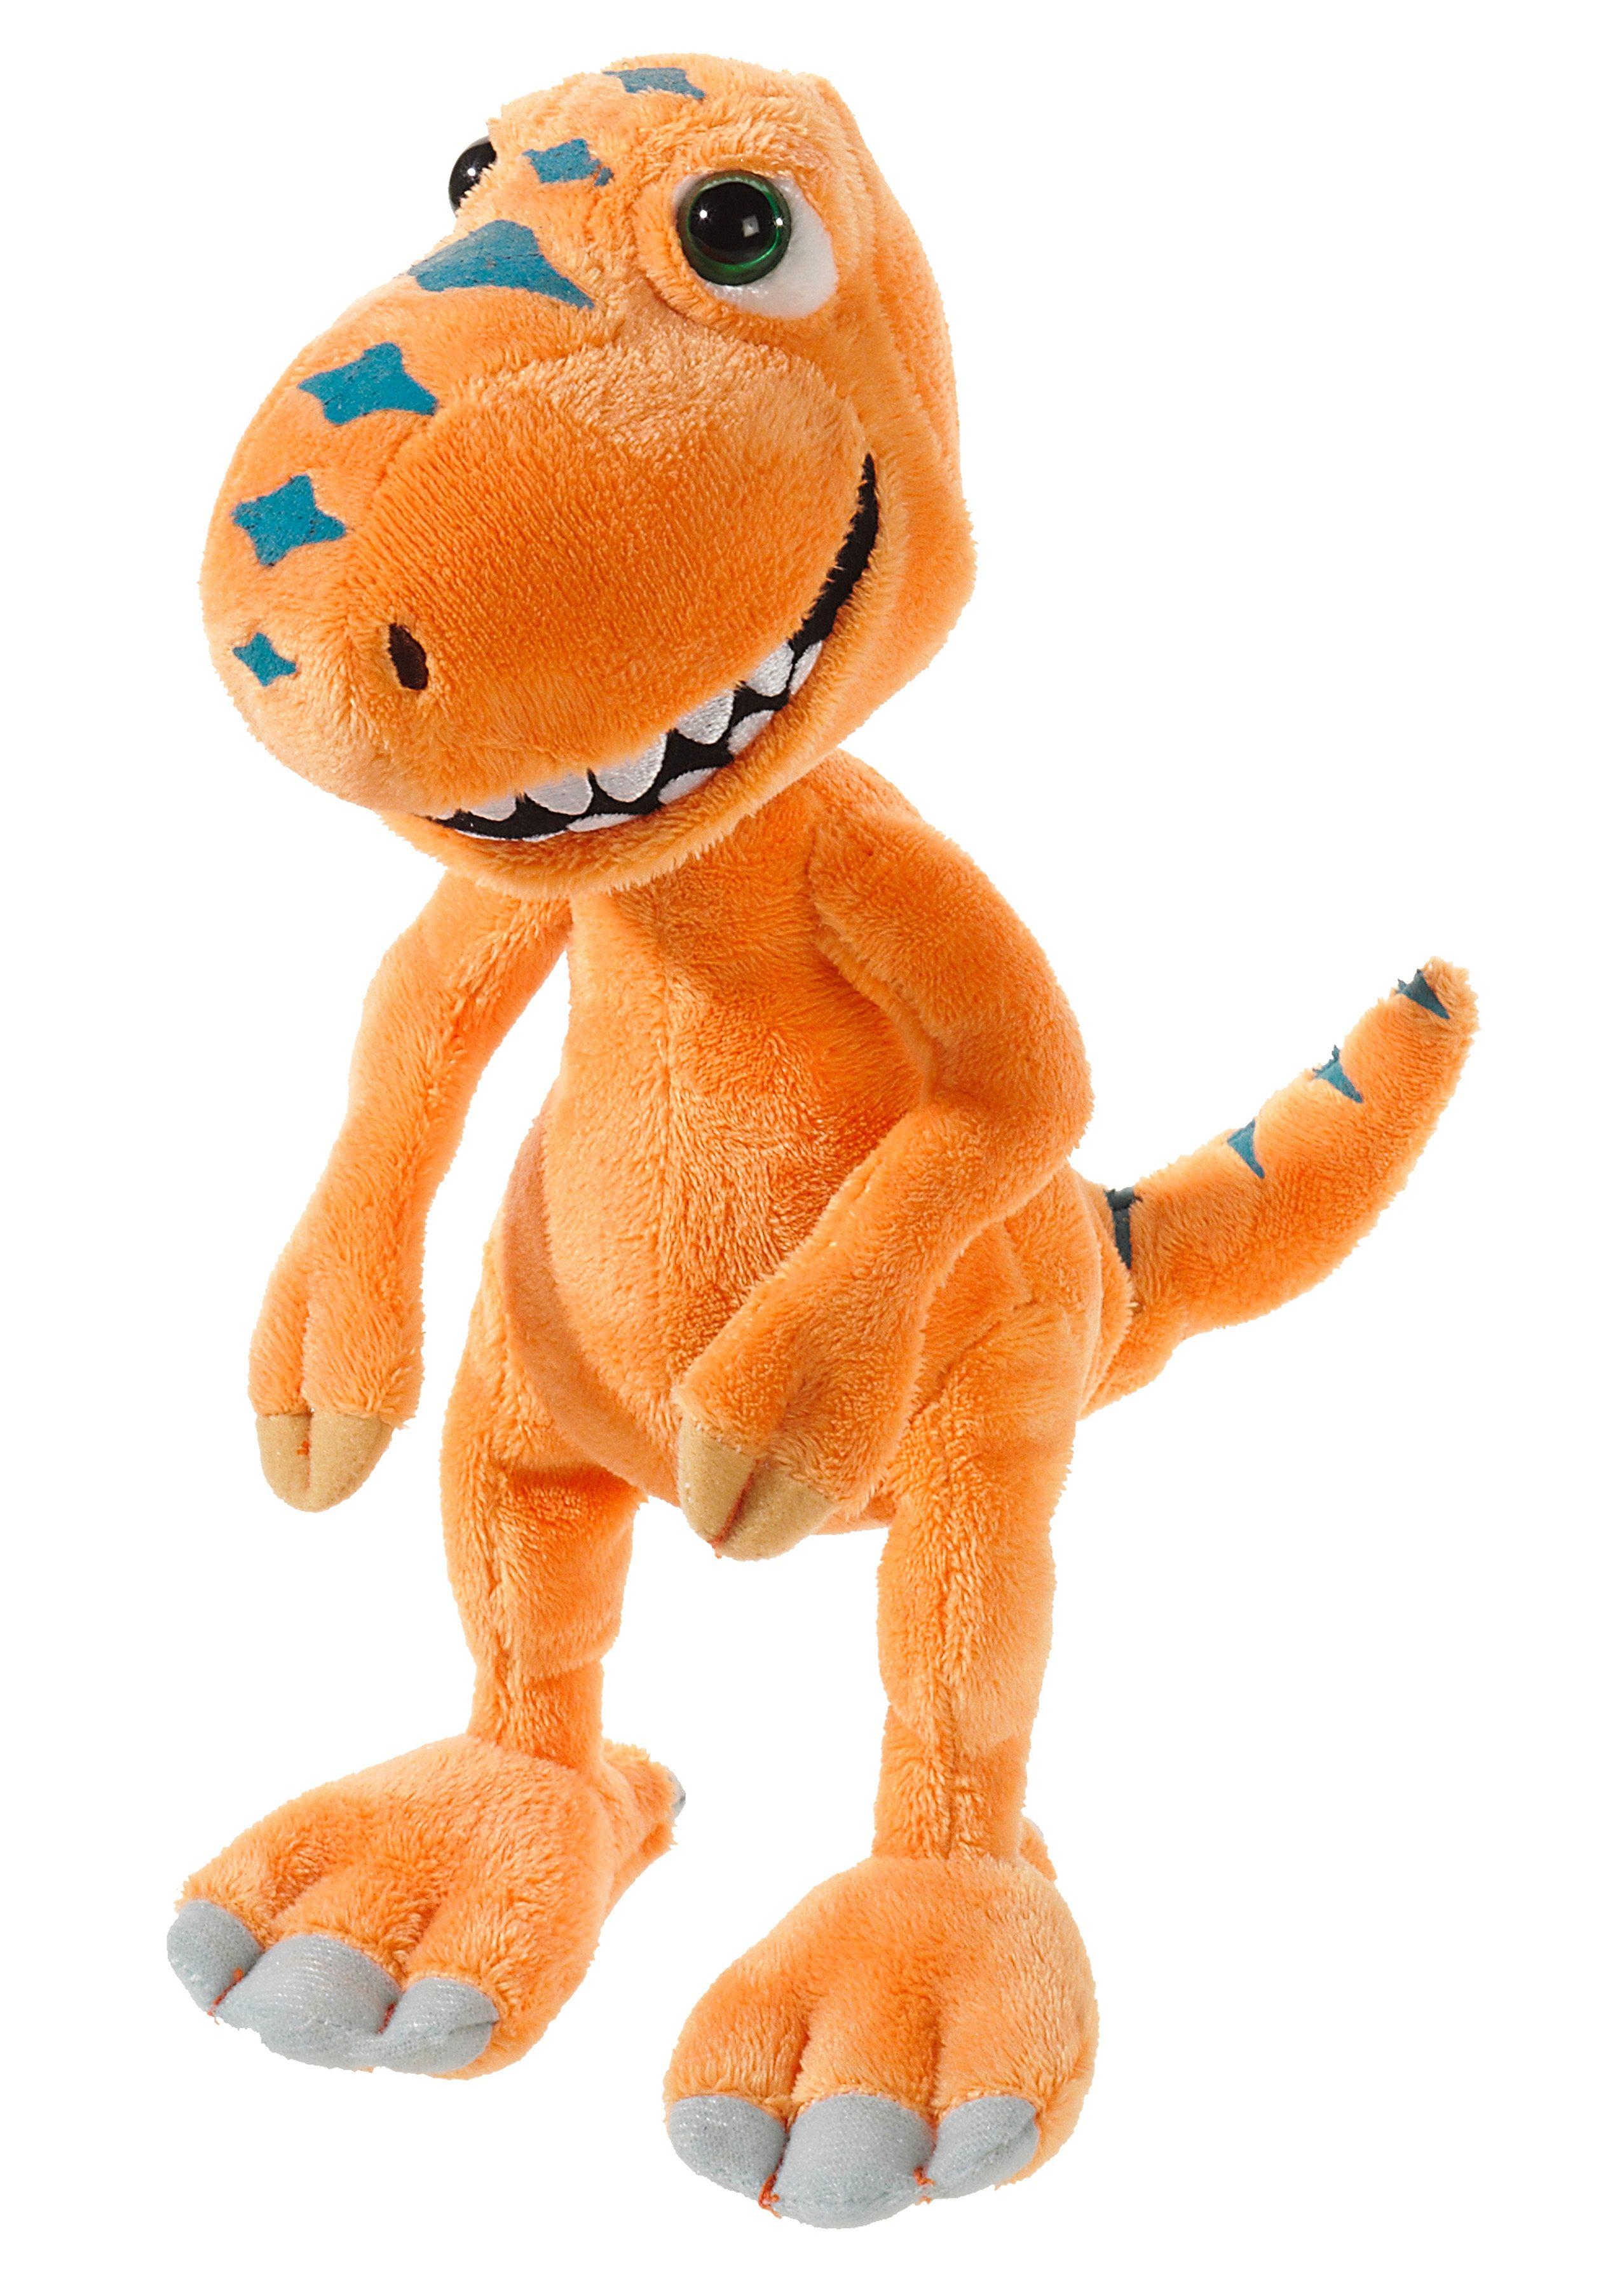 Heunec Plüschtier »Dino Zug Buddy«